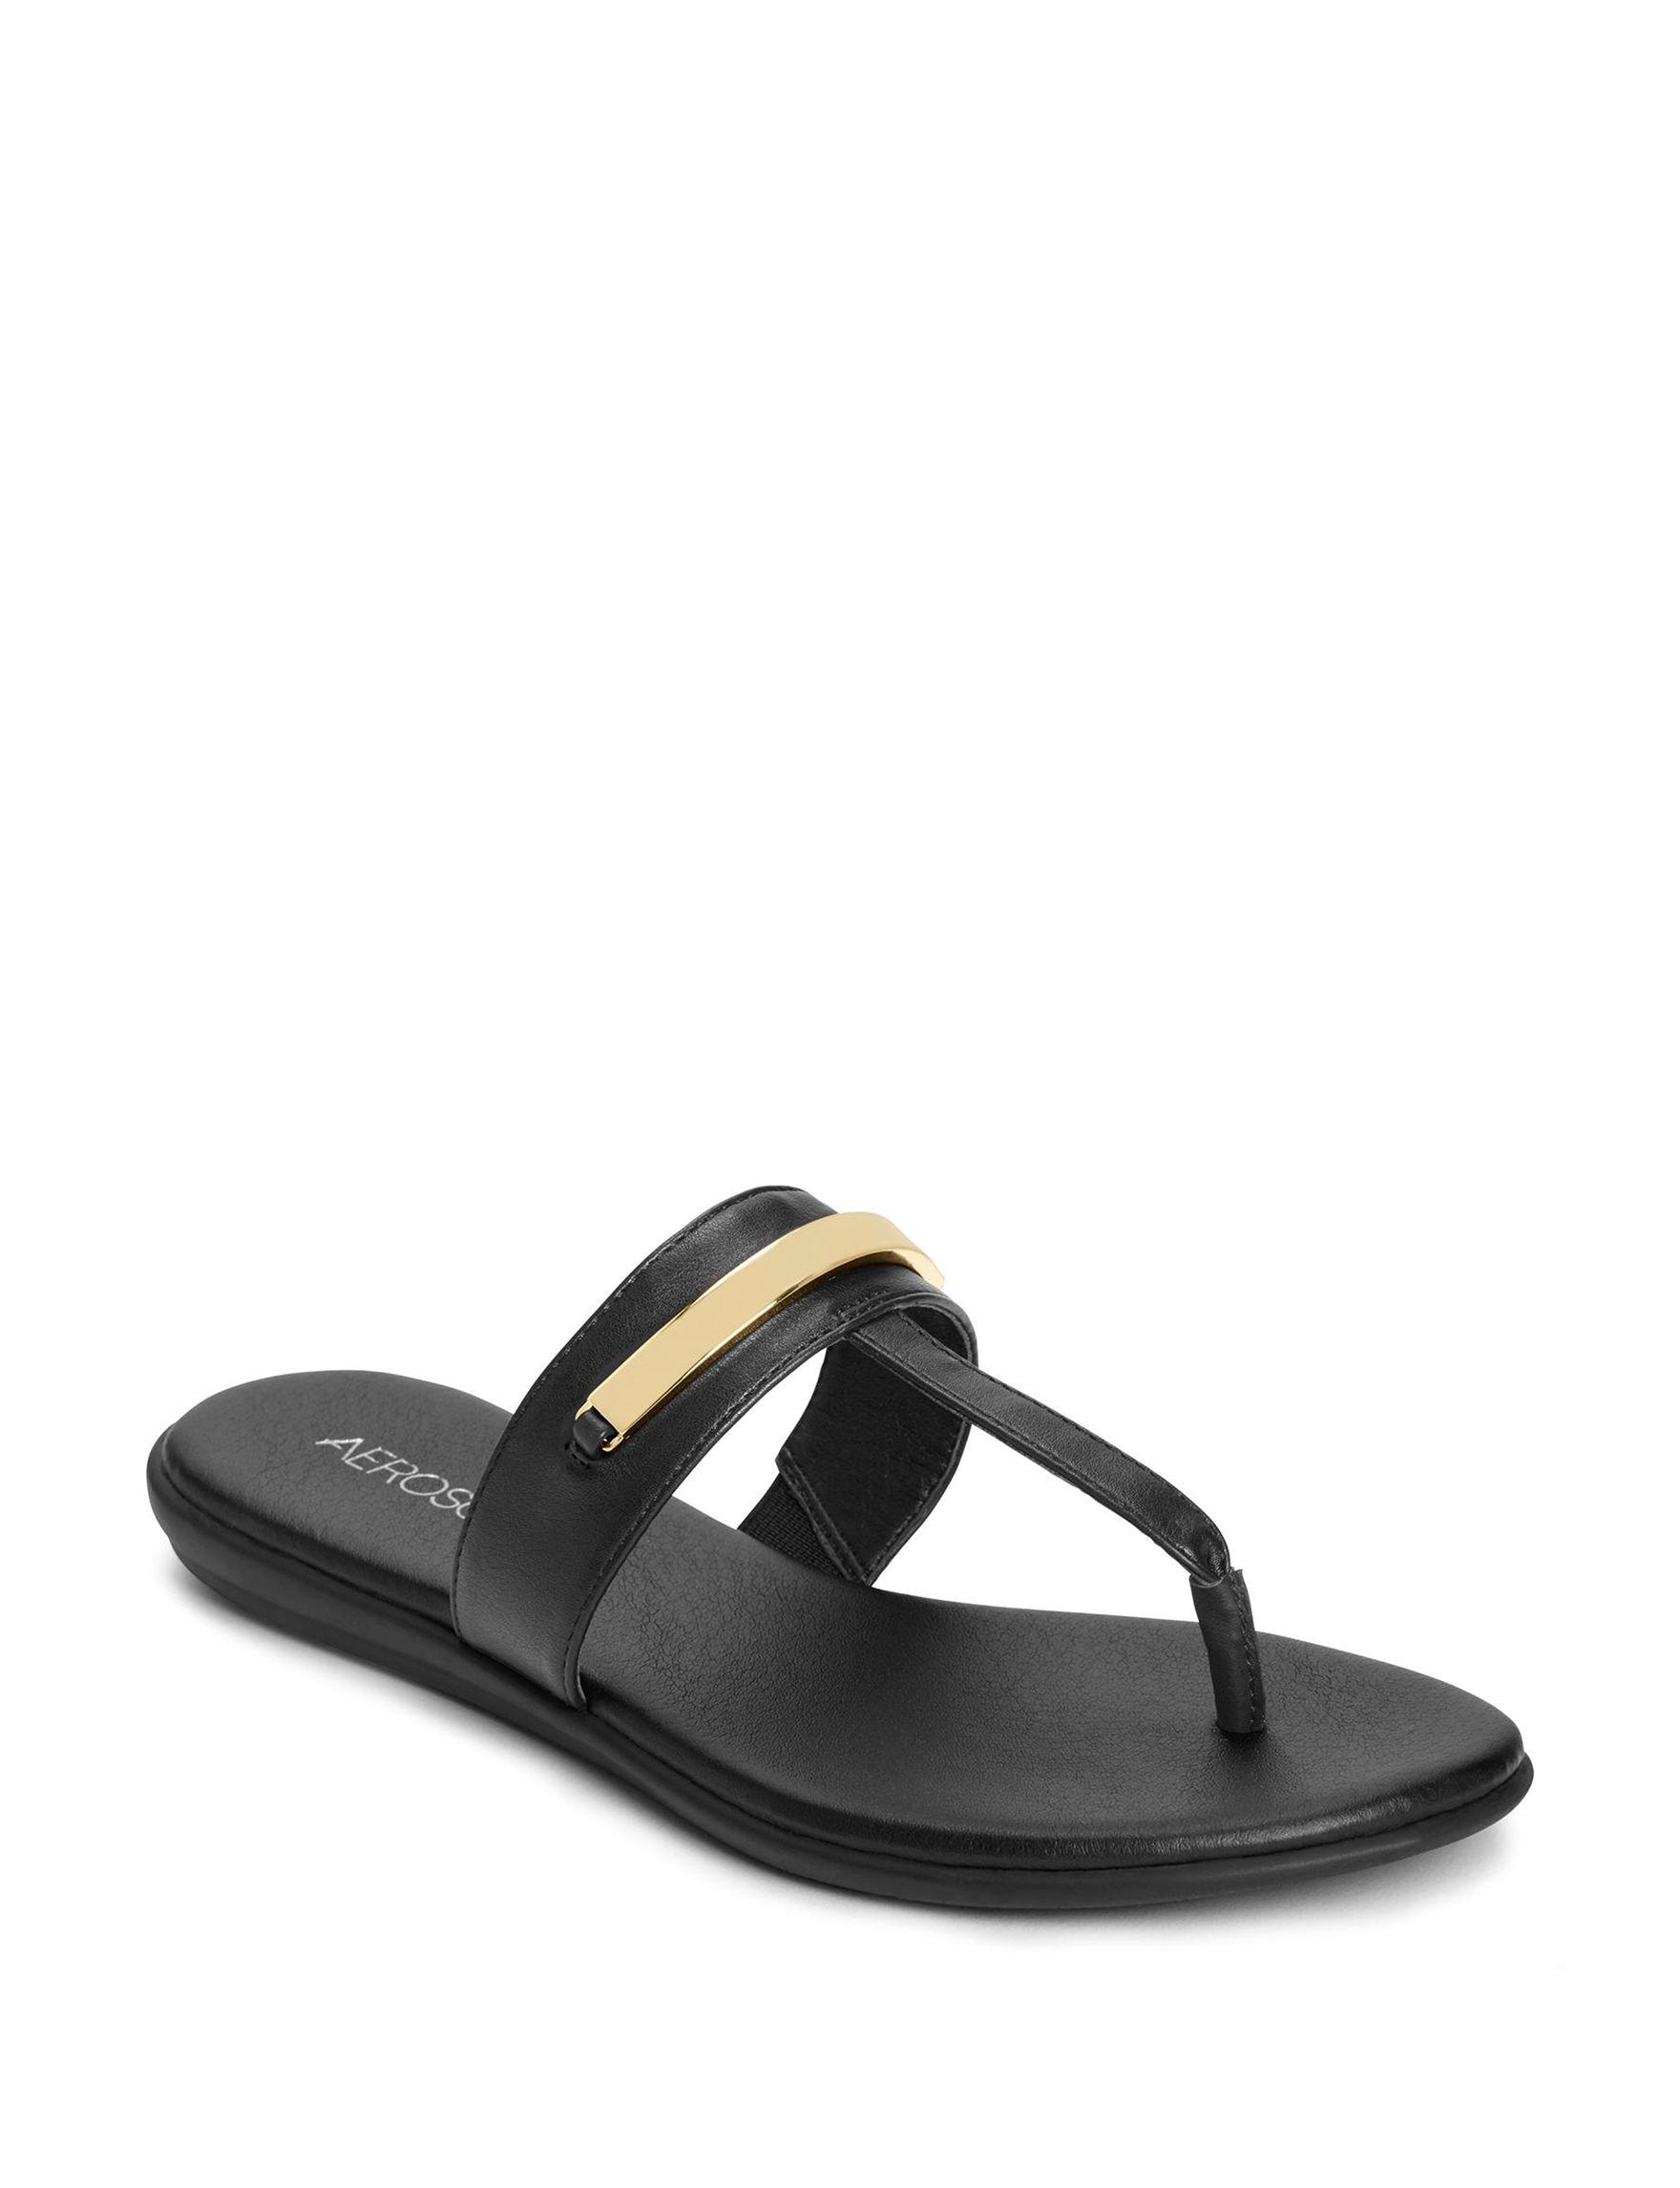 Aerosoles Black Flat Sandals Flip Flops